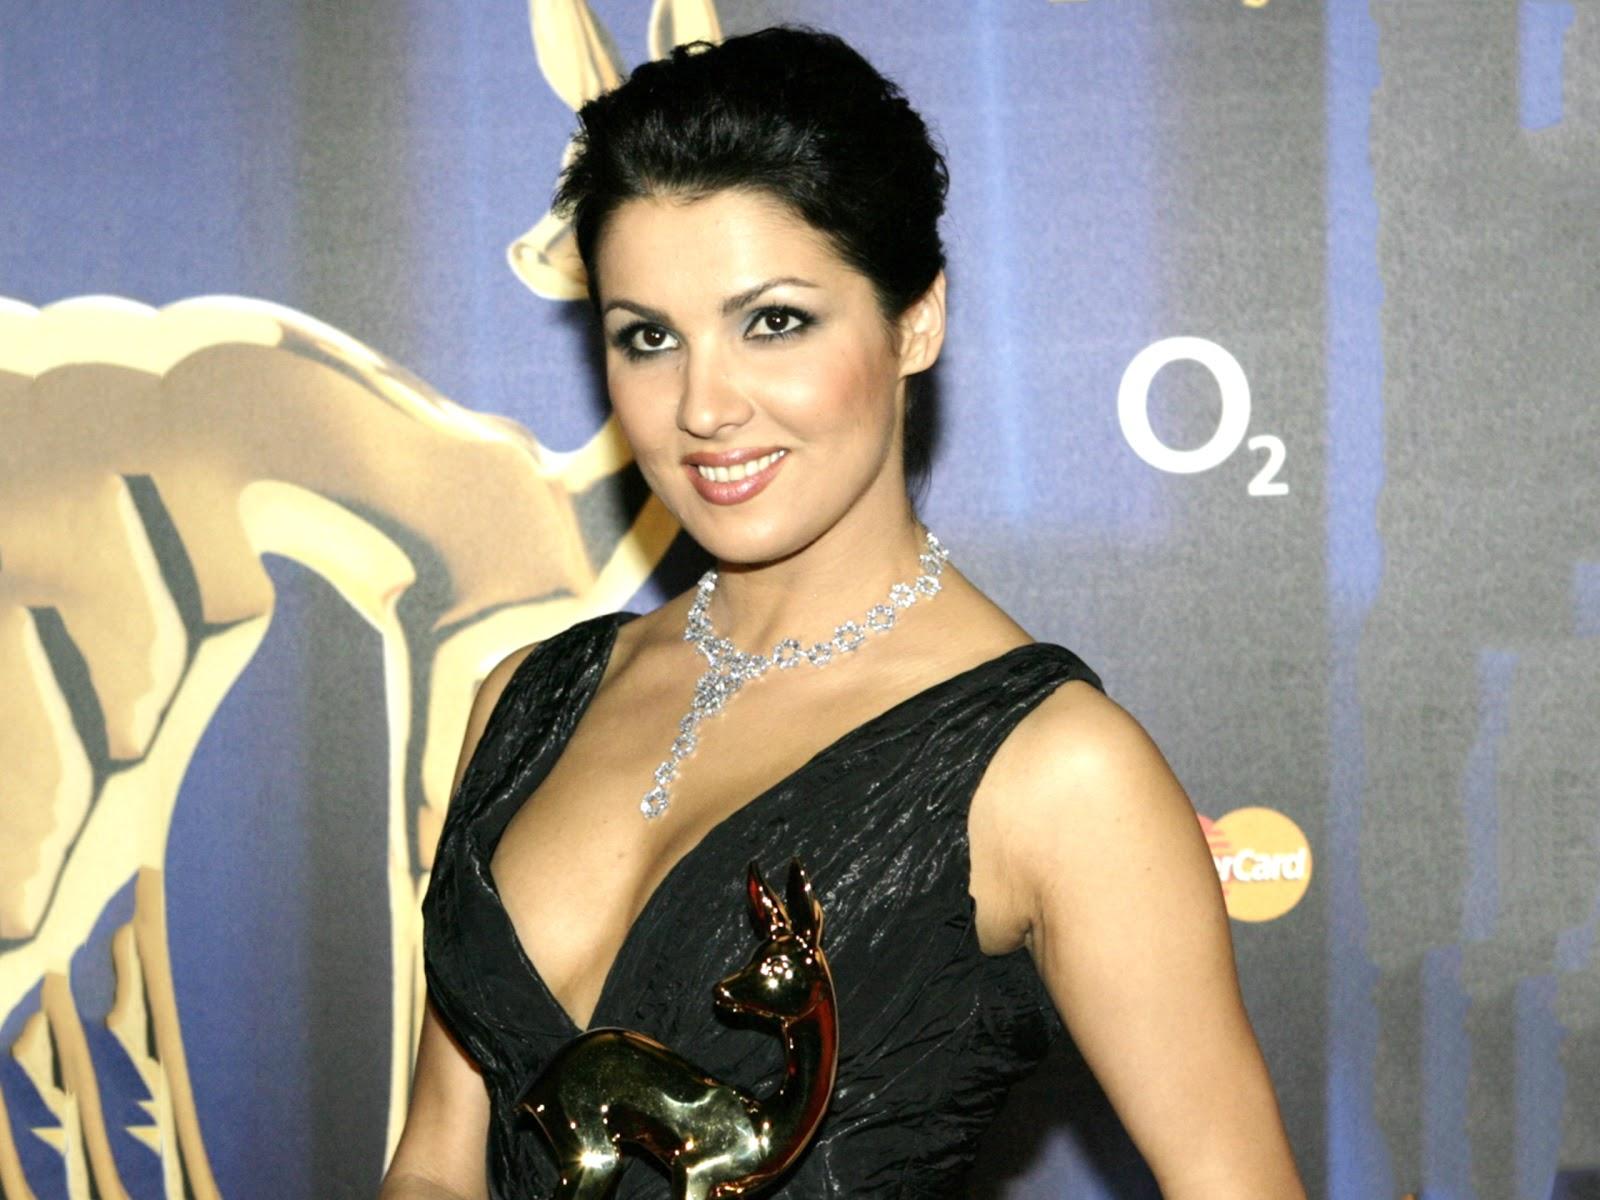 http://3.bp.blogspot.com/-d8ECUxKvfE8/UHmLTkDd9nI/AAAAAAAADms/EF7zo4wRacM/s1600/Anna_Netrebko-008.jpeg